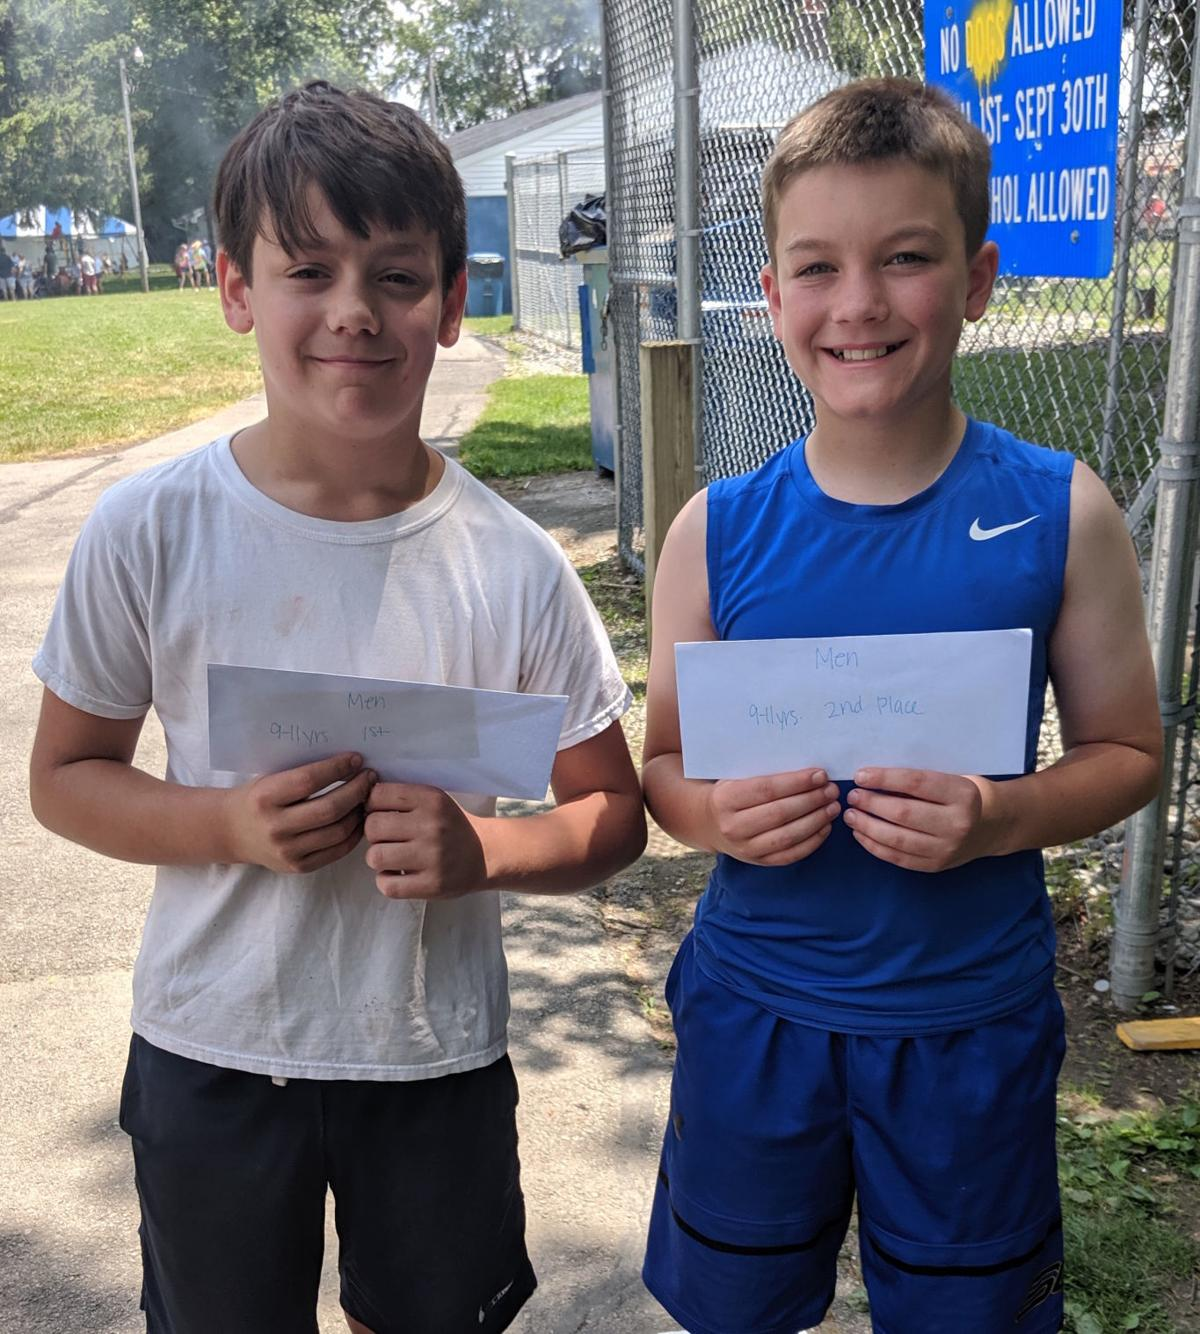 Boys age 9-11 years